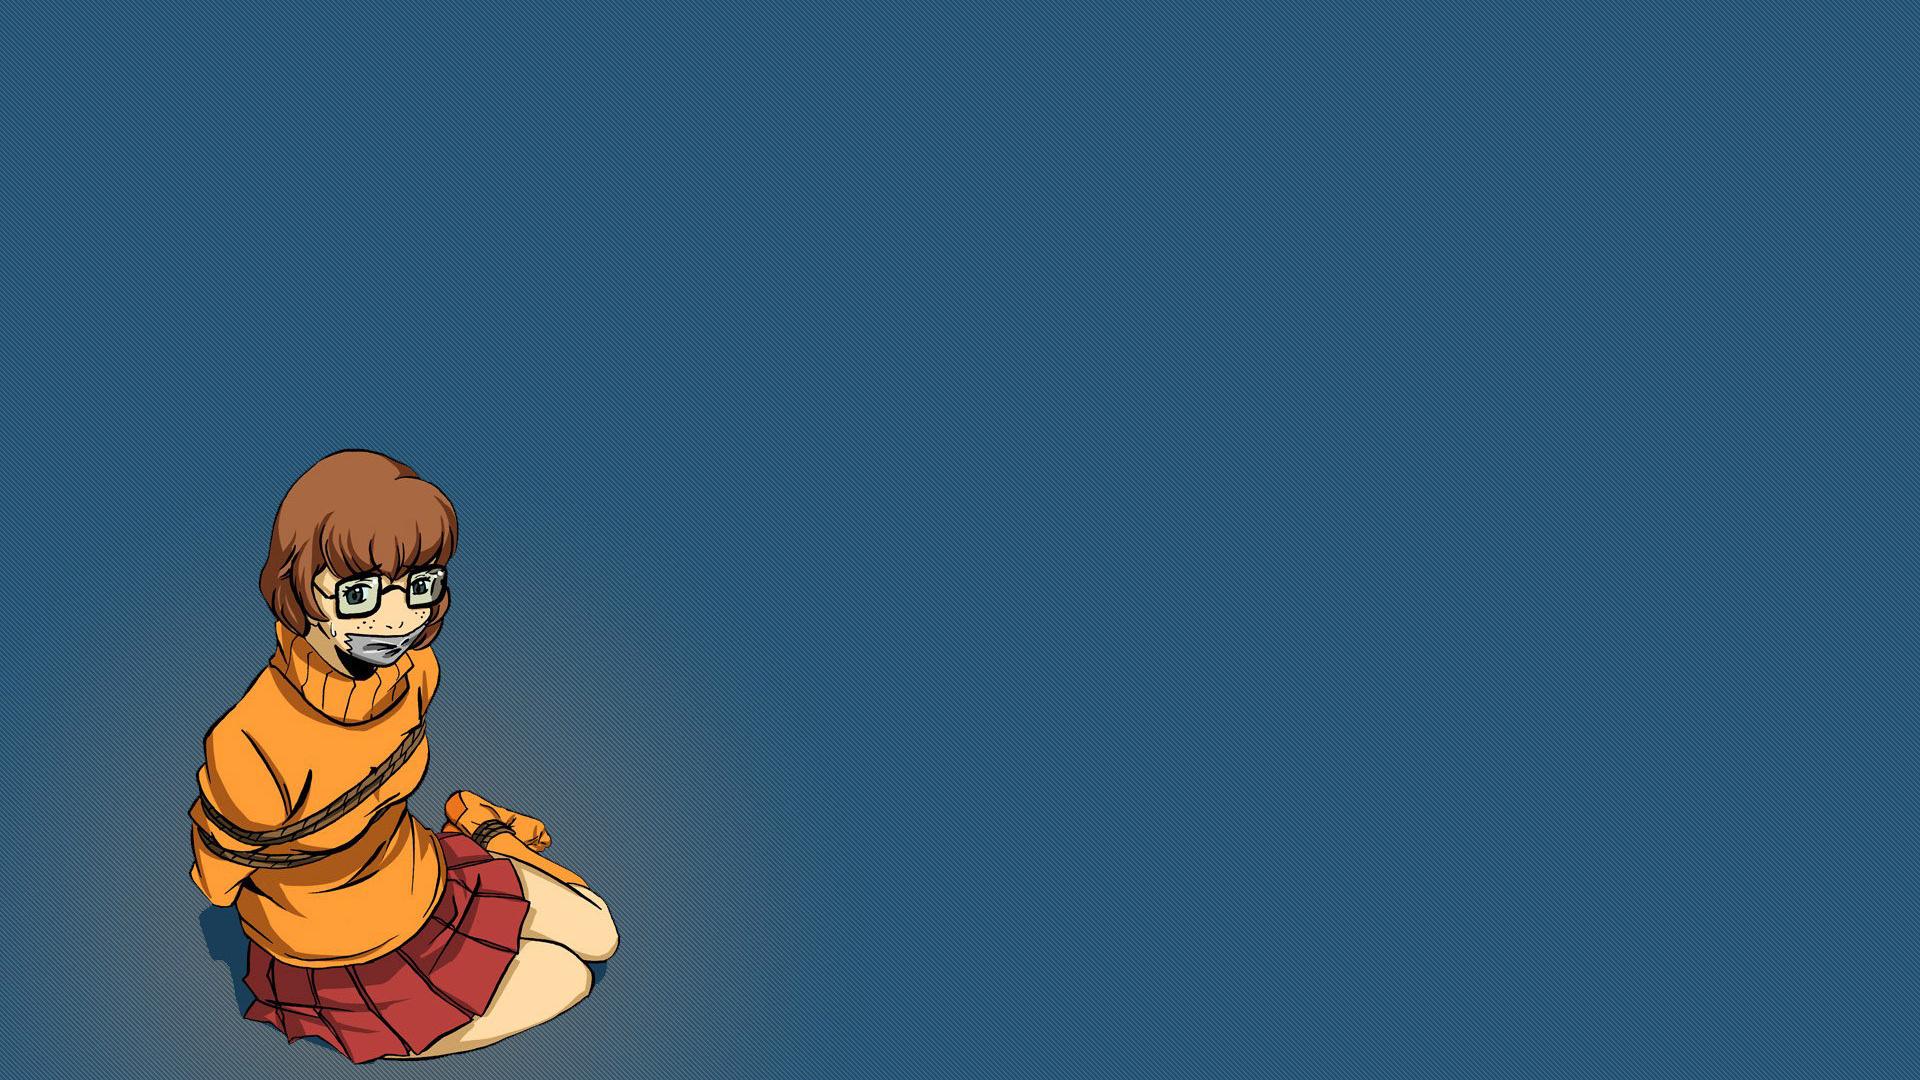 Free Download Velma Scooby Doo Wallpaper 4815 1920x1200